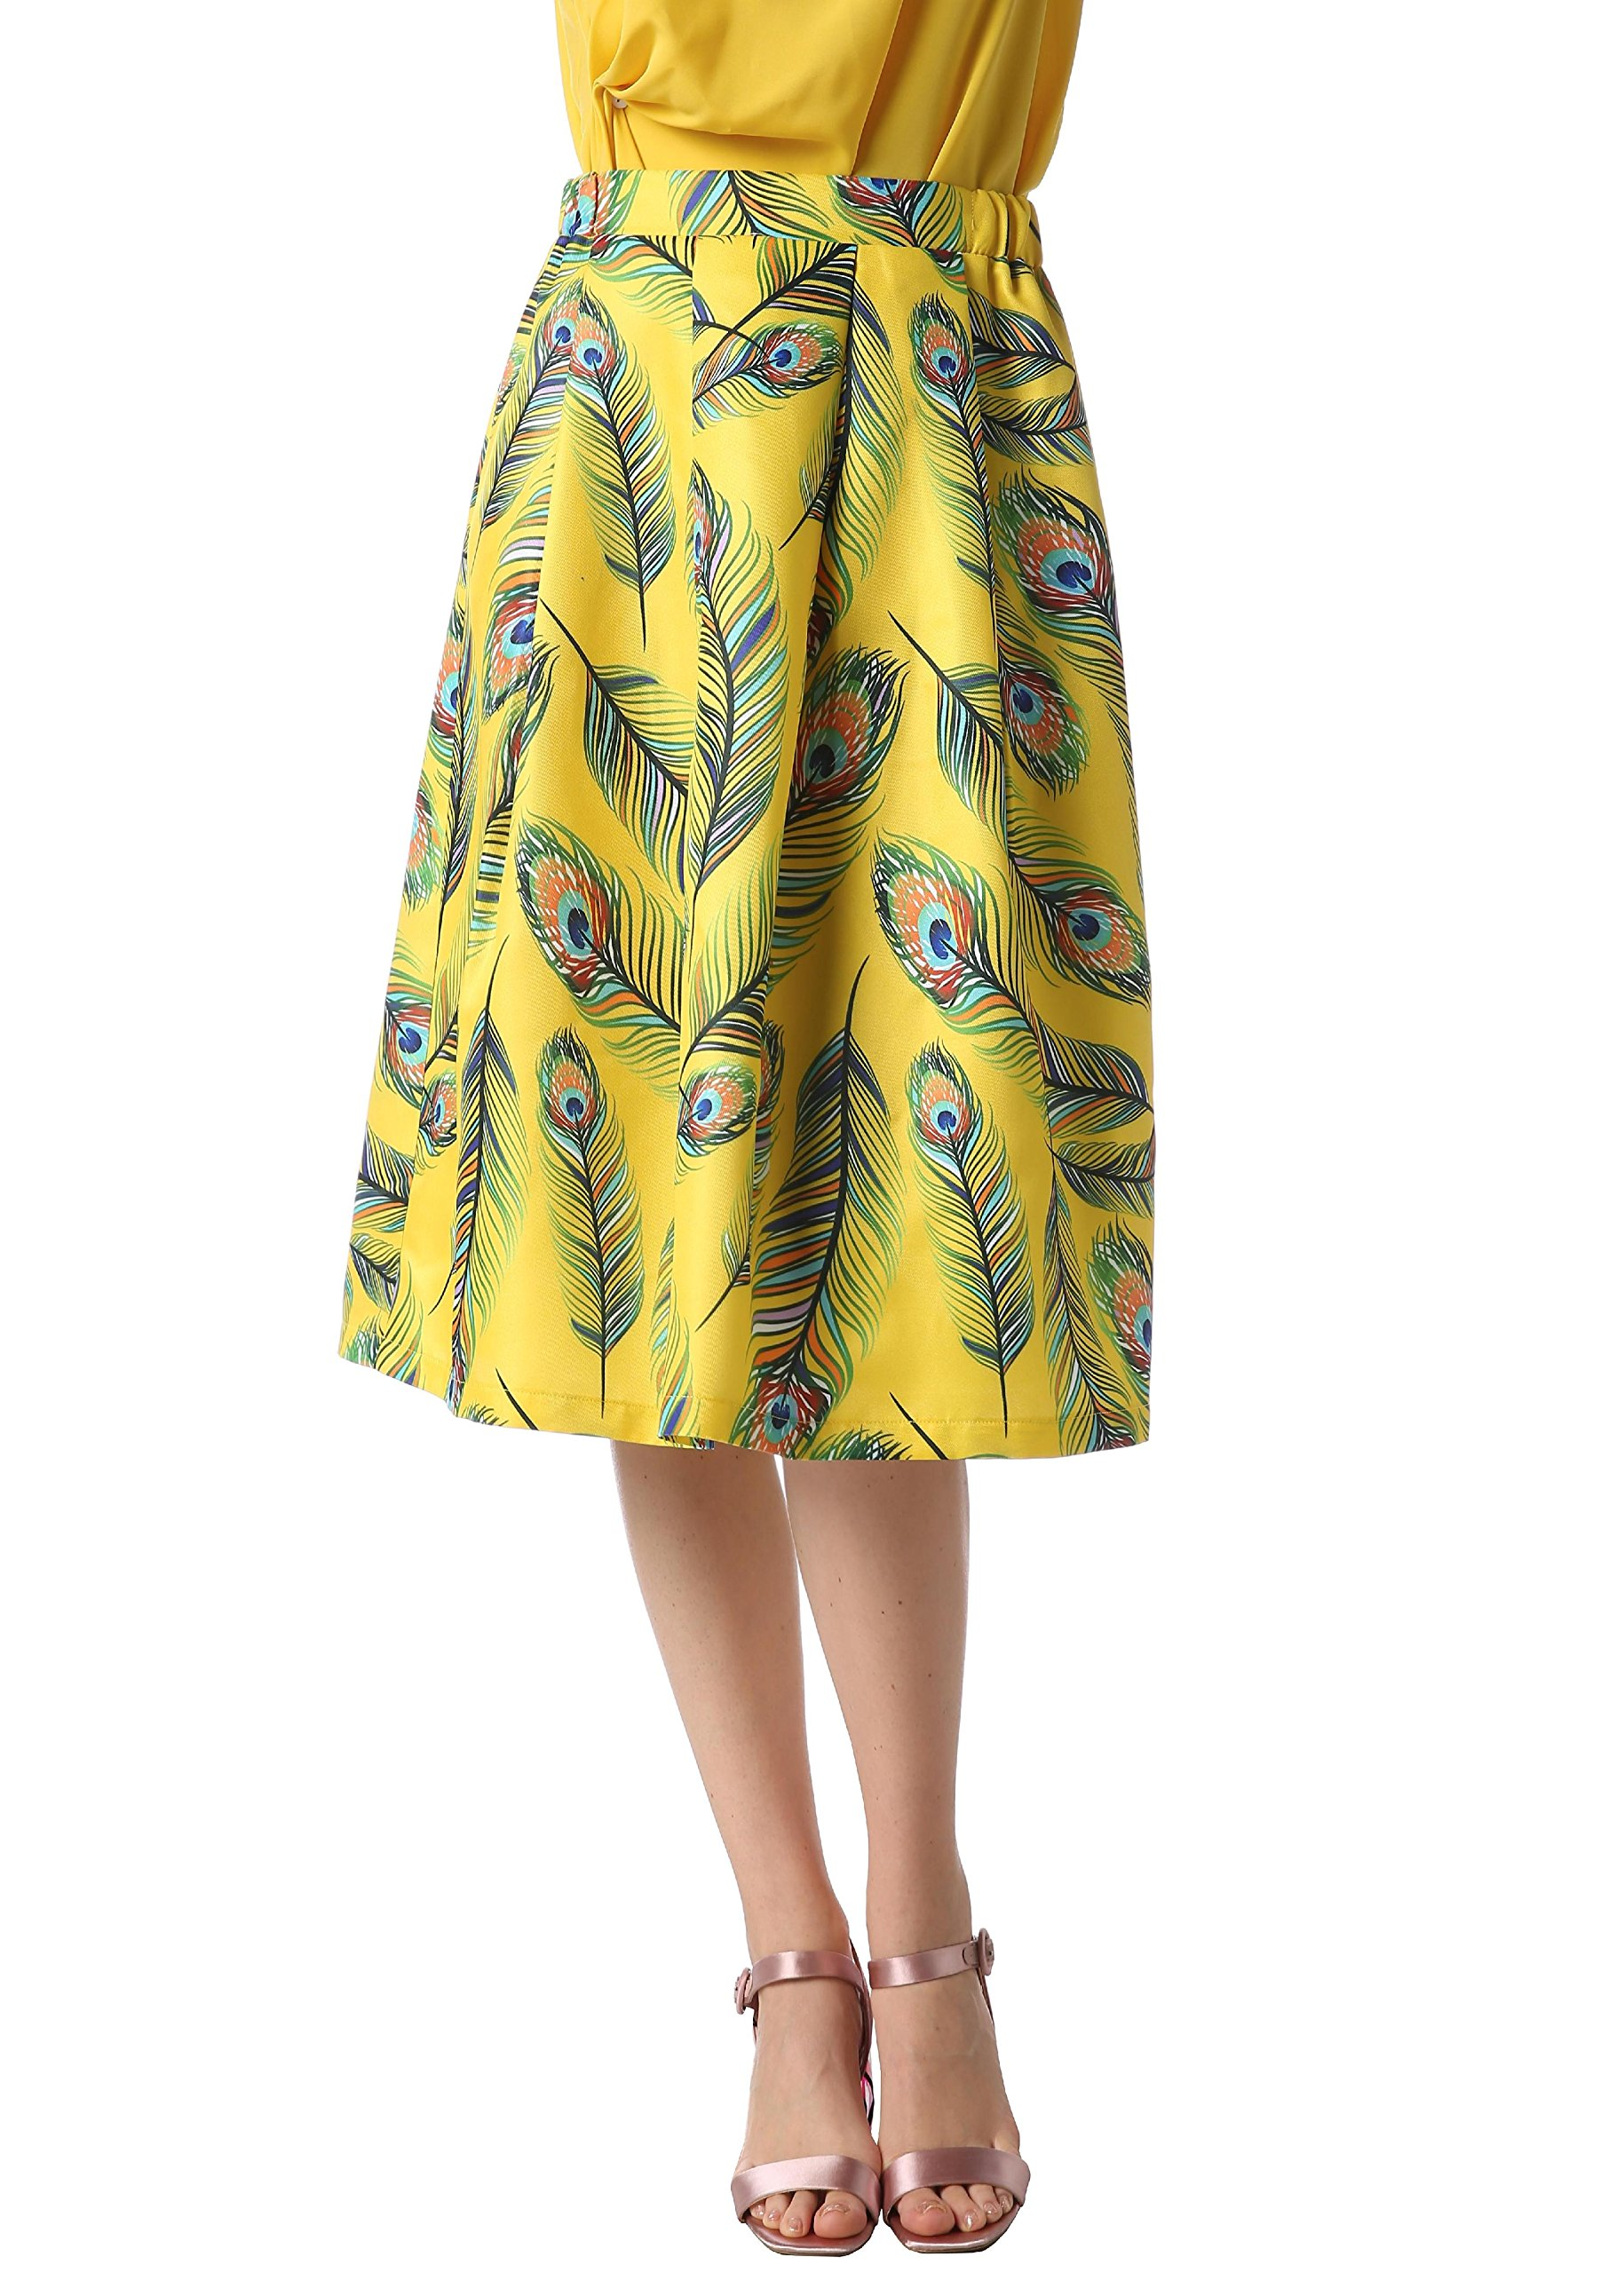 Foshow Womens Midi Skirt Knee Length Floral Pleated Flared Vintage Summer High Waist Boho Skirts